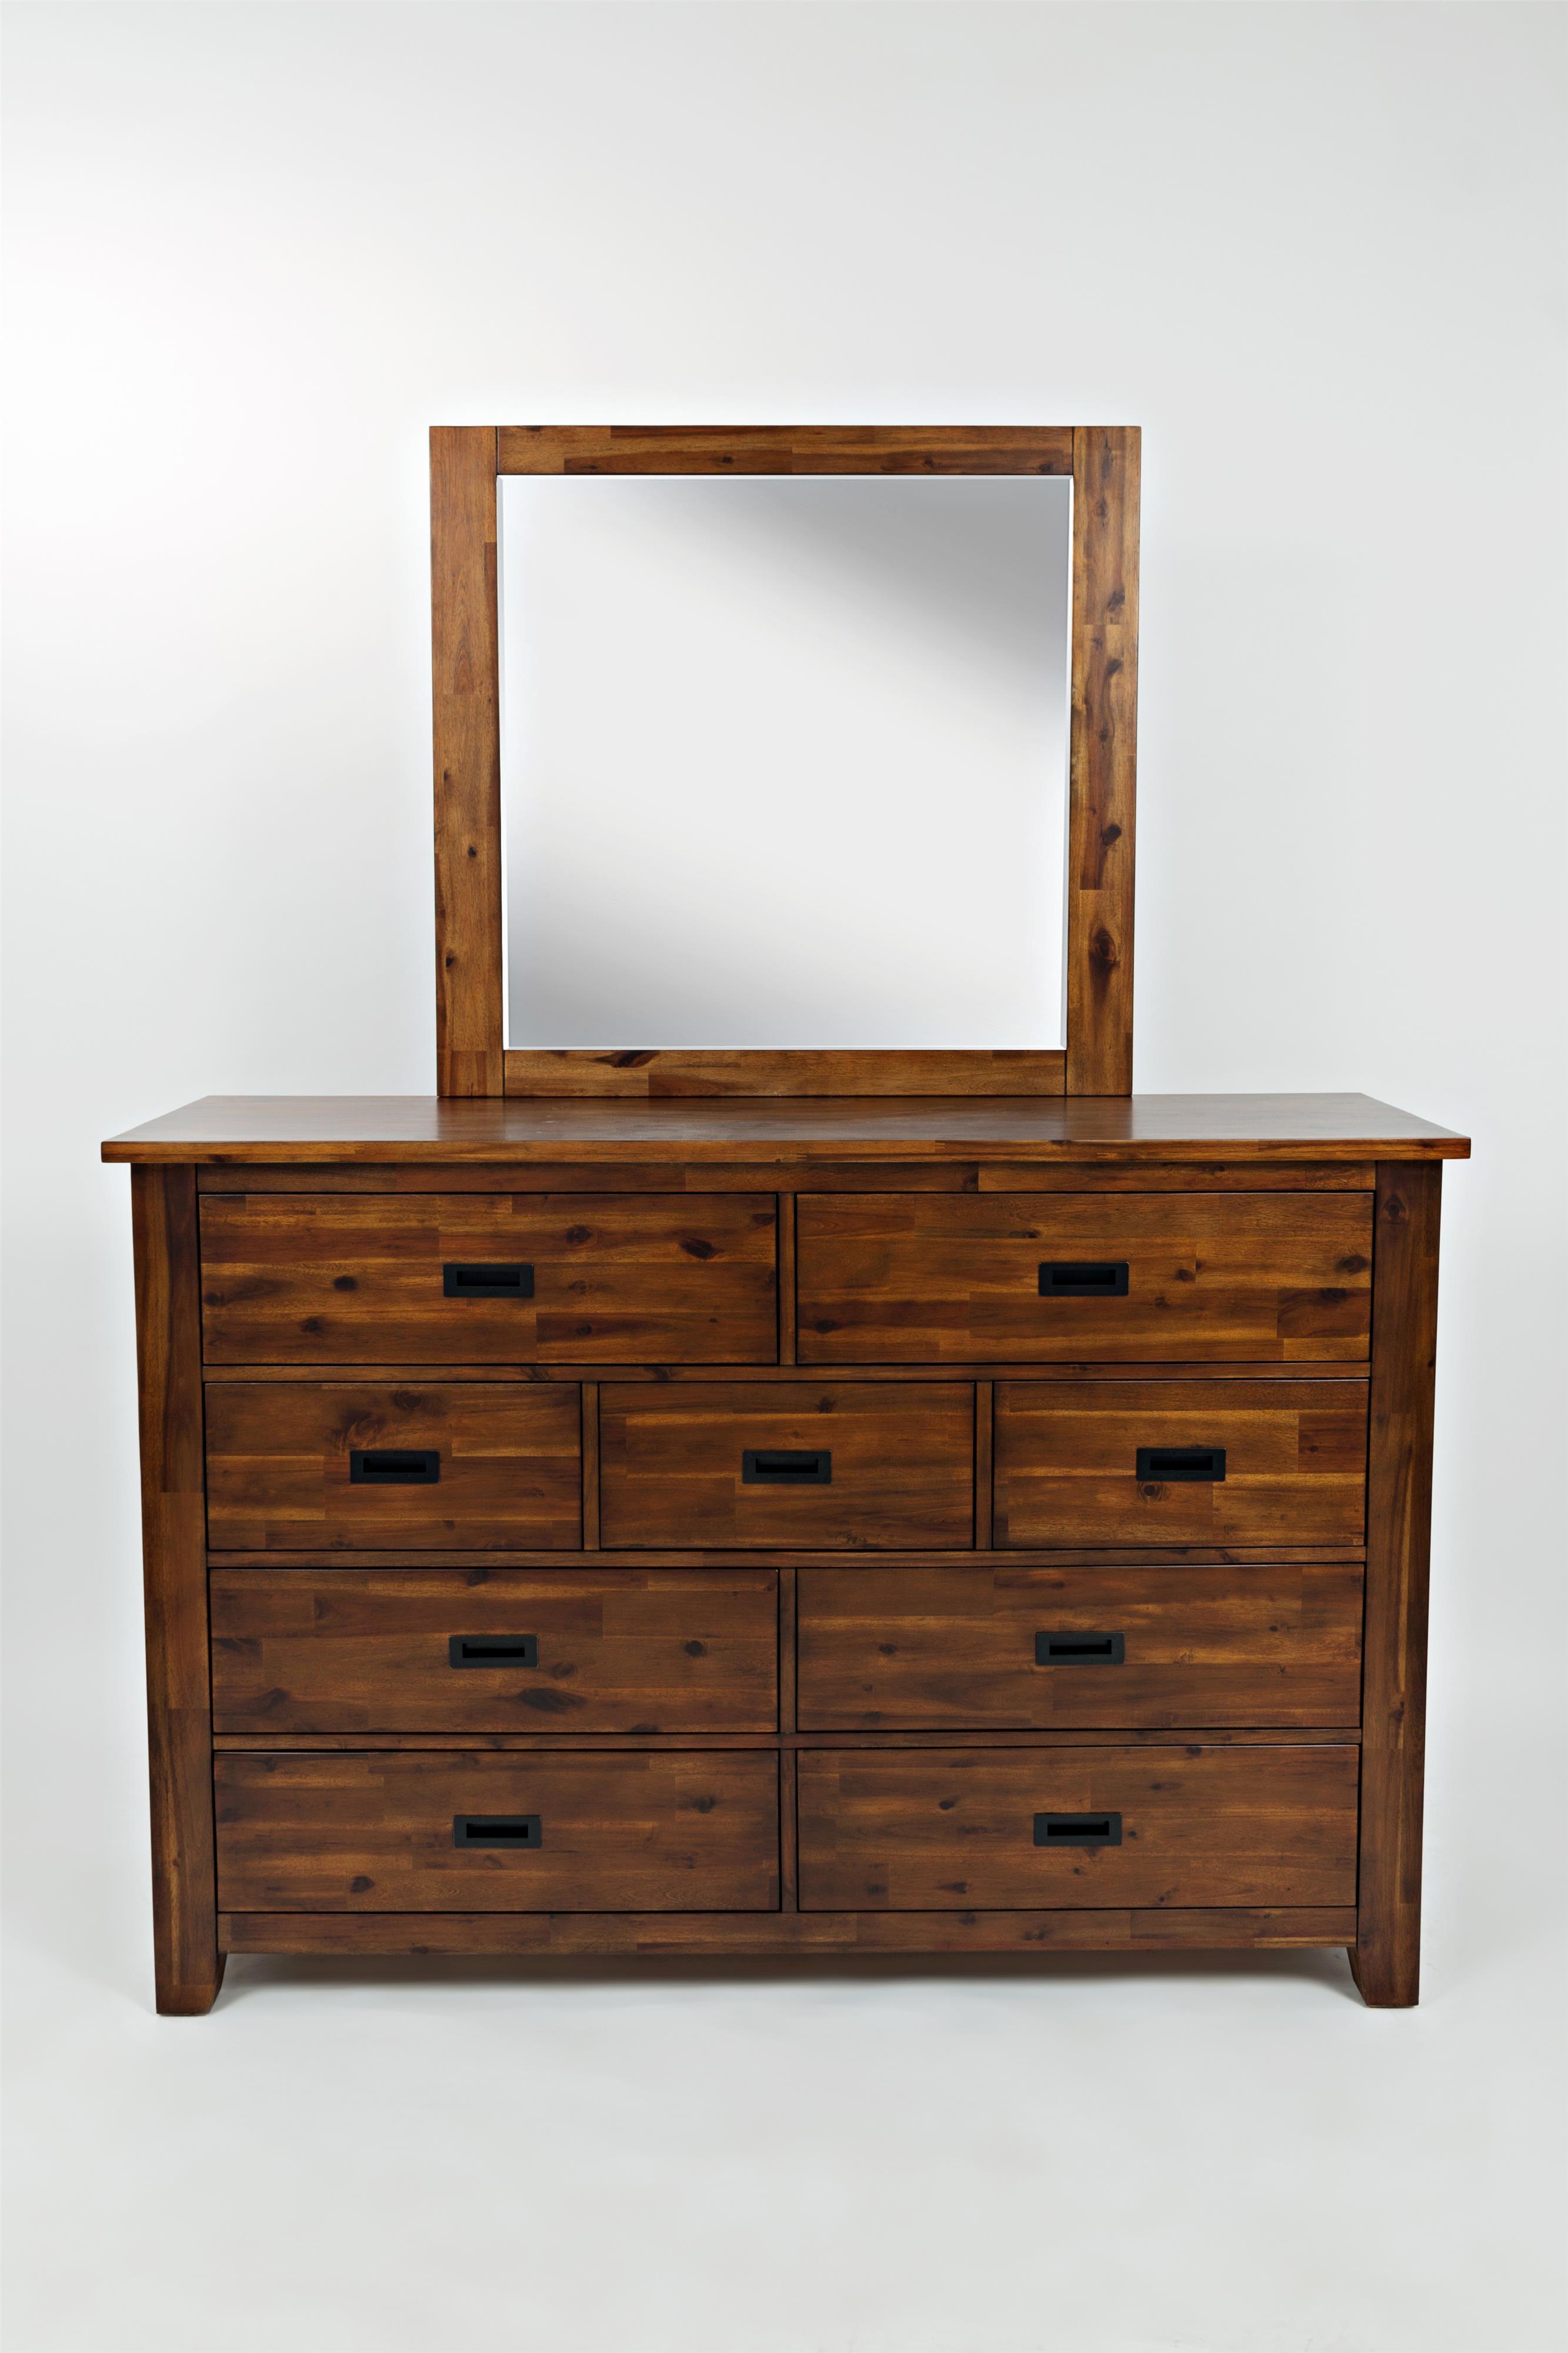 Jofran Coolidge Corner 9 Drawer Dresser and Mirror - Item Number: 1503-10+20